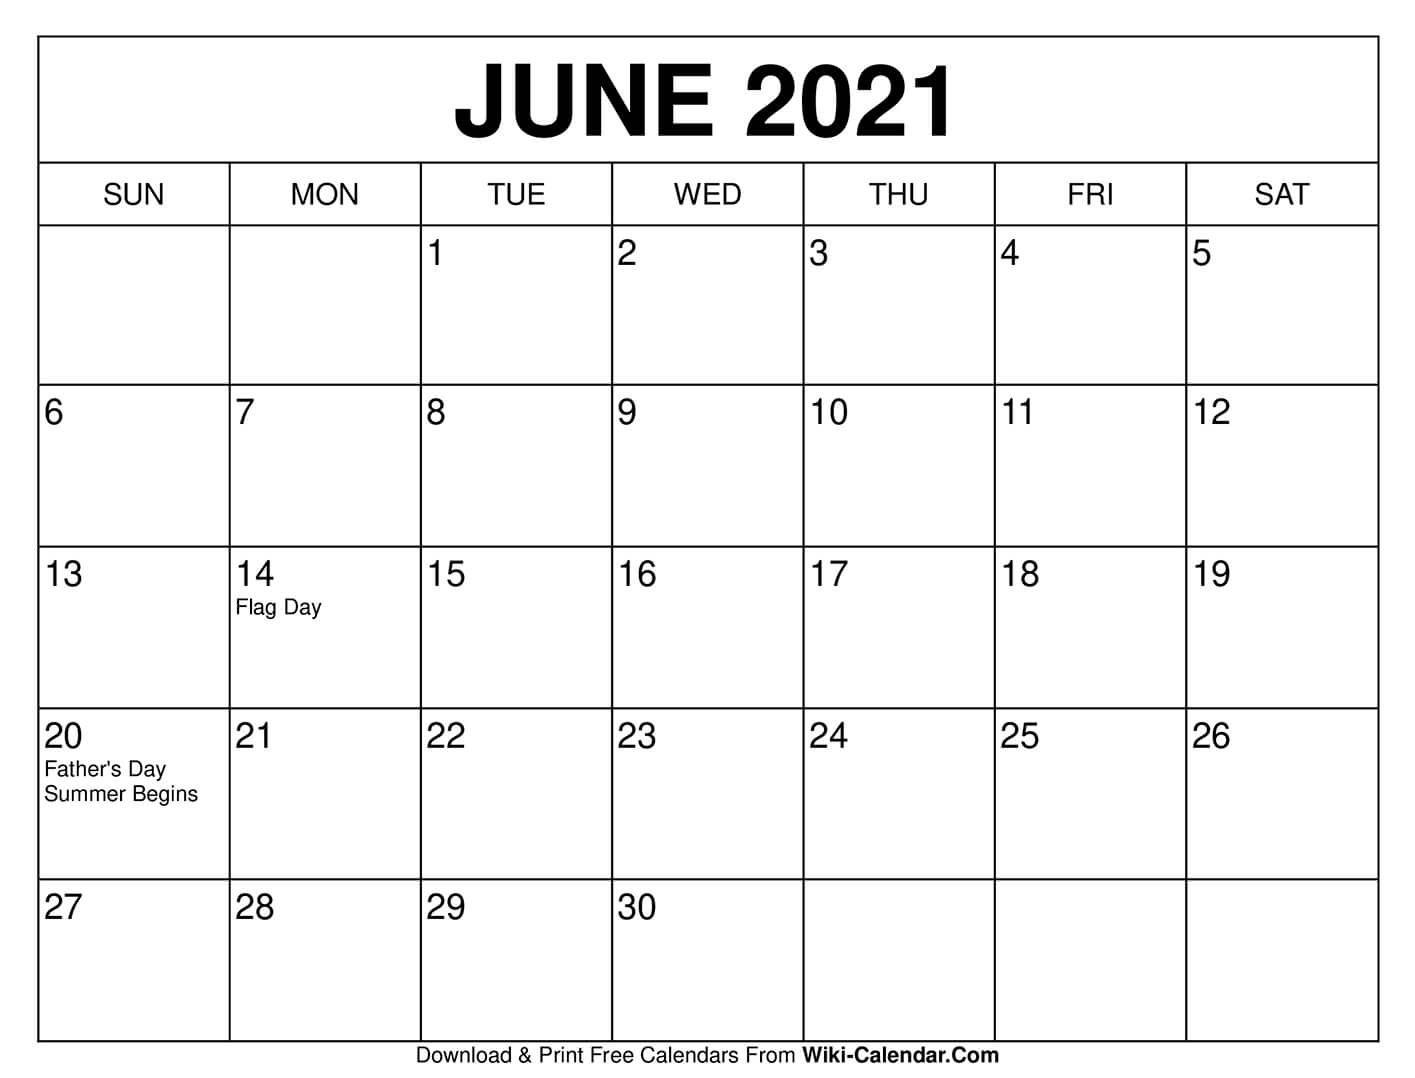 June 2021 Calendar In 2020 | Calendar Printables Calendar